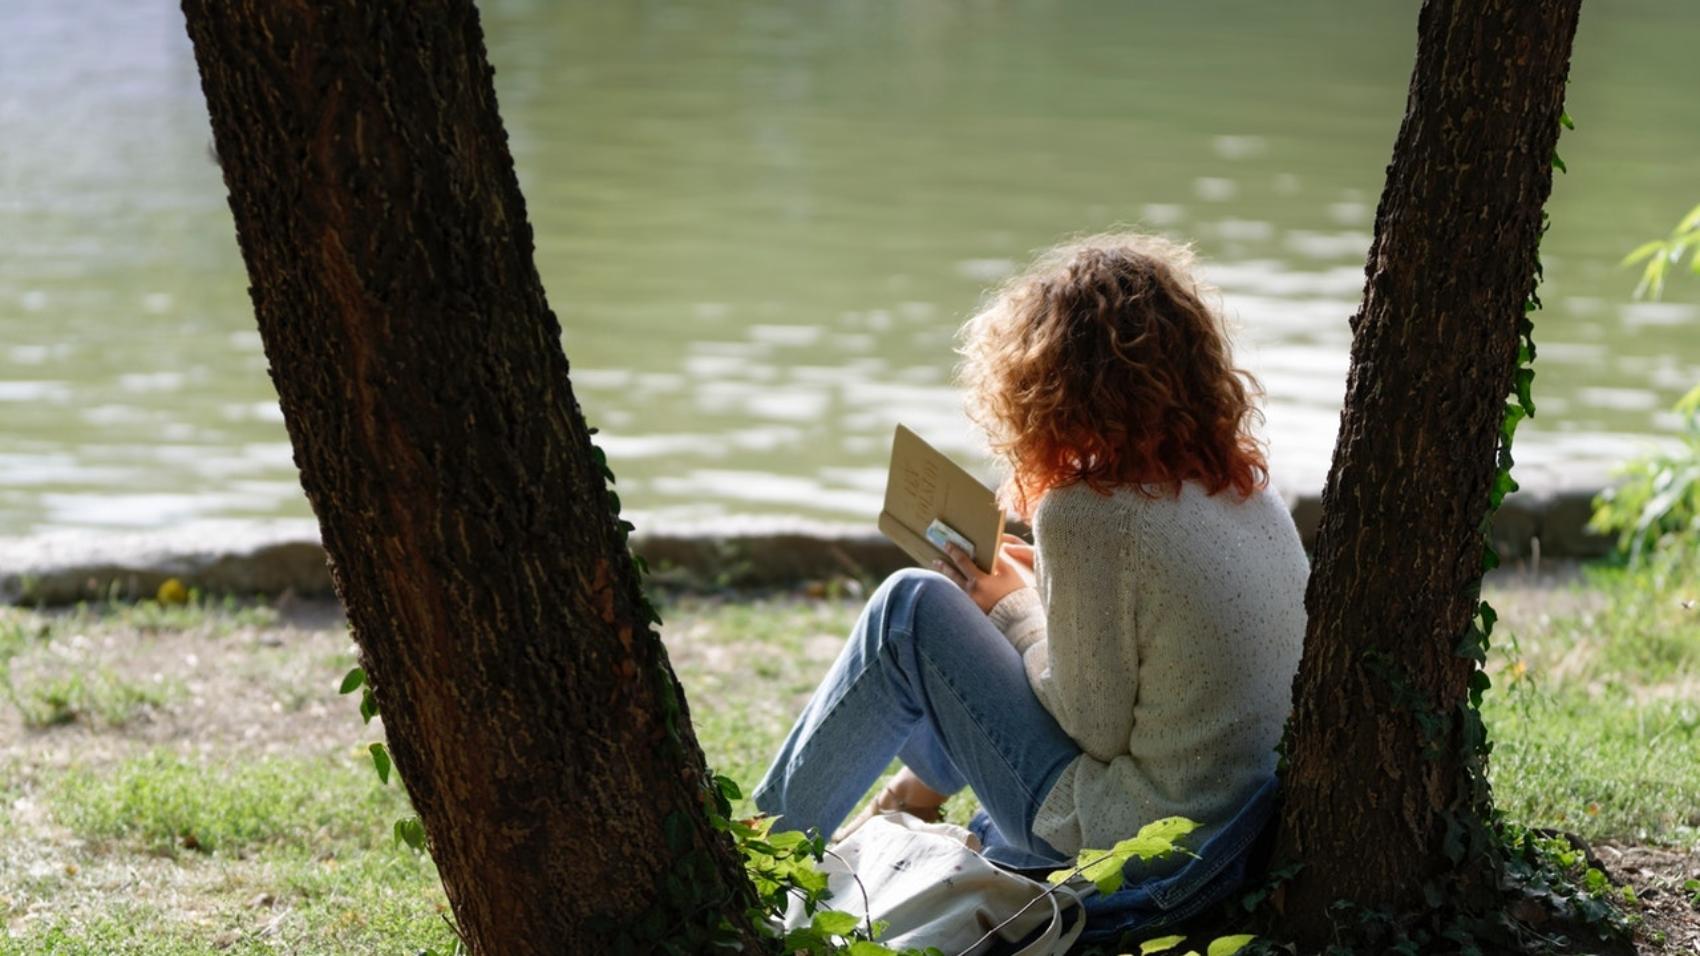 book-lake-park-2961121